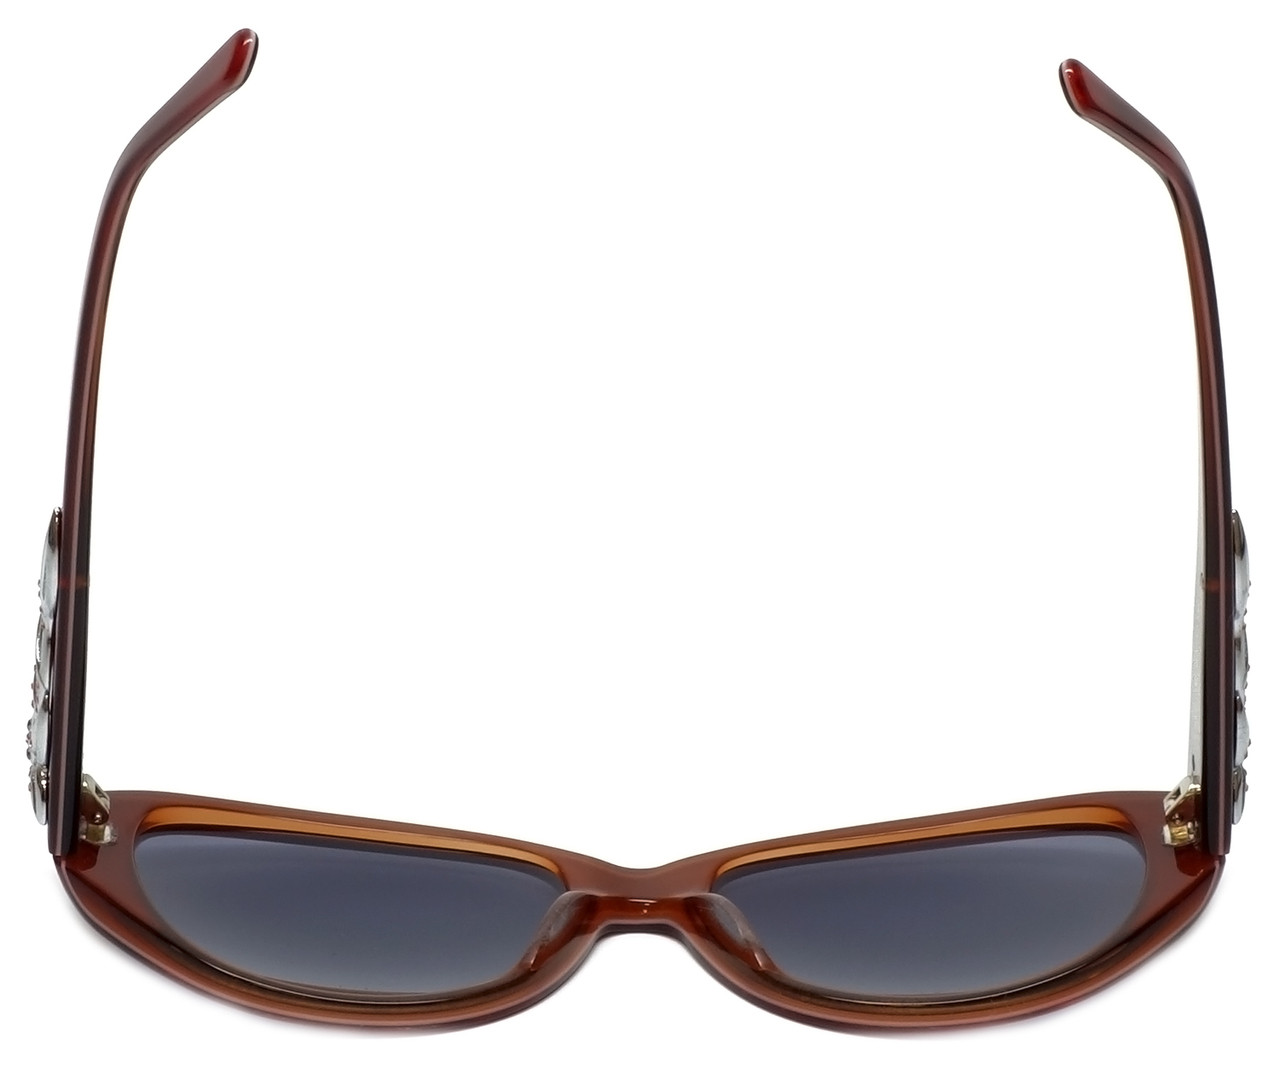 66ee144da8 Judith Leiber Designer Sunglasses JL5002-06 in Ruby in Grey Lens ...